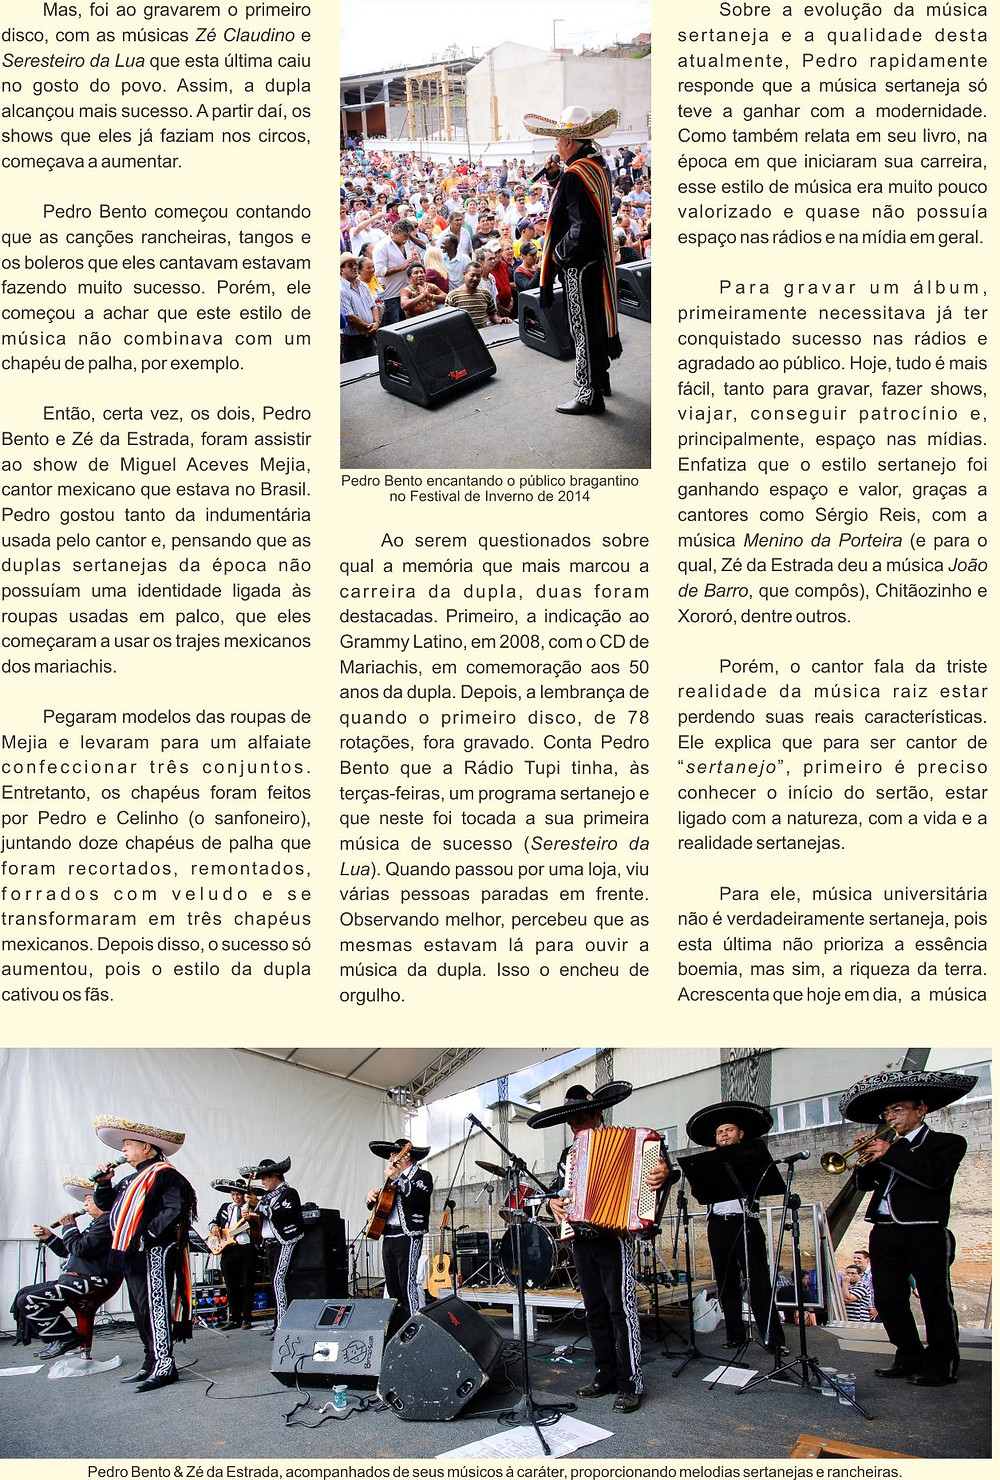 Pedro_Bento_&_Zé_da_Estrada_-_2014_-_II.jpg